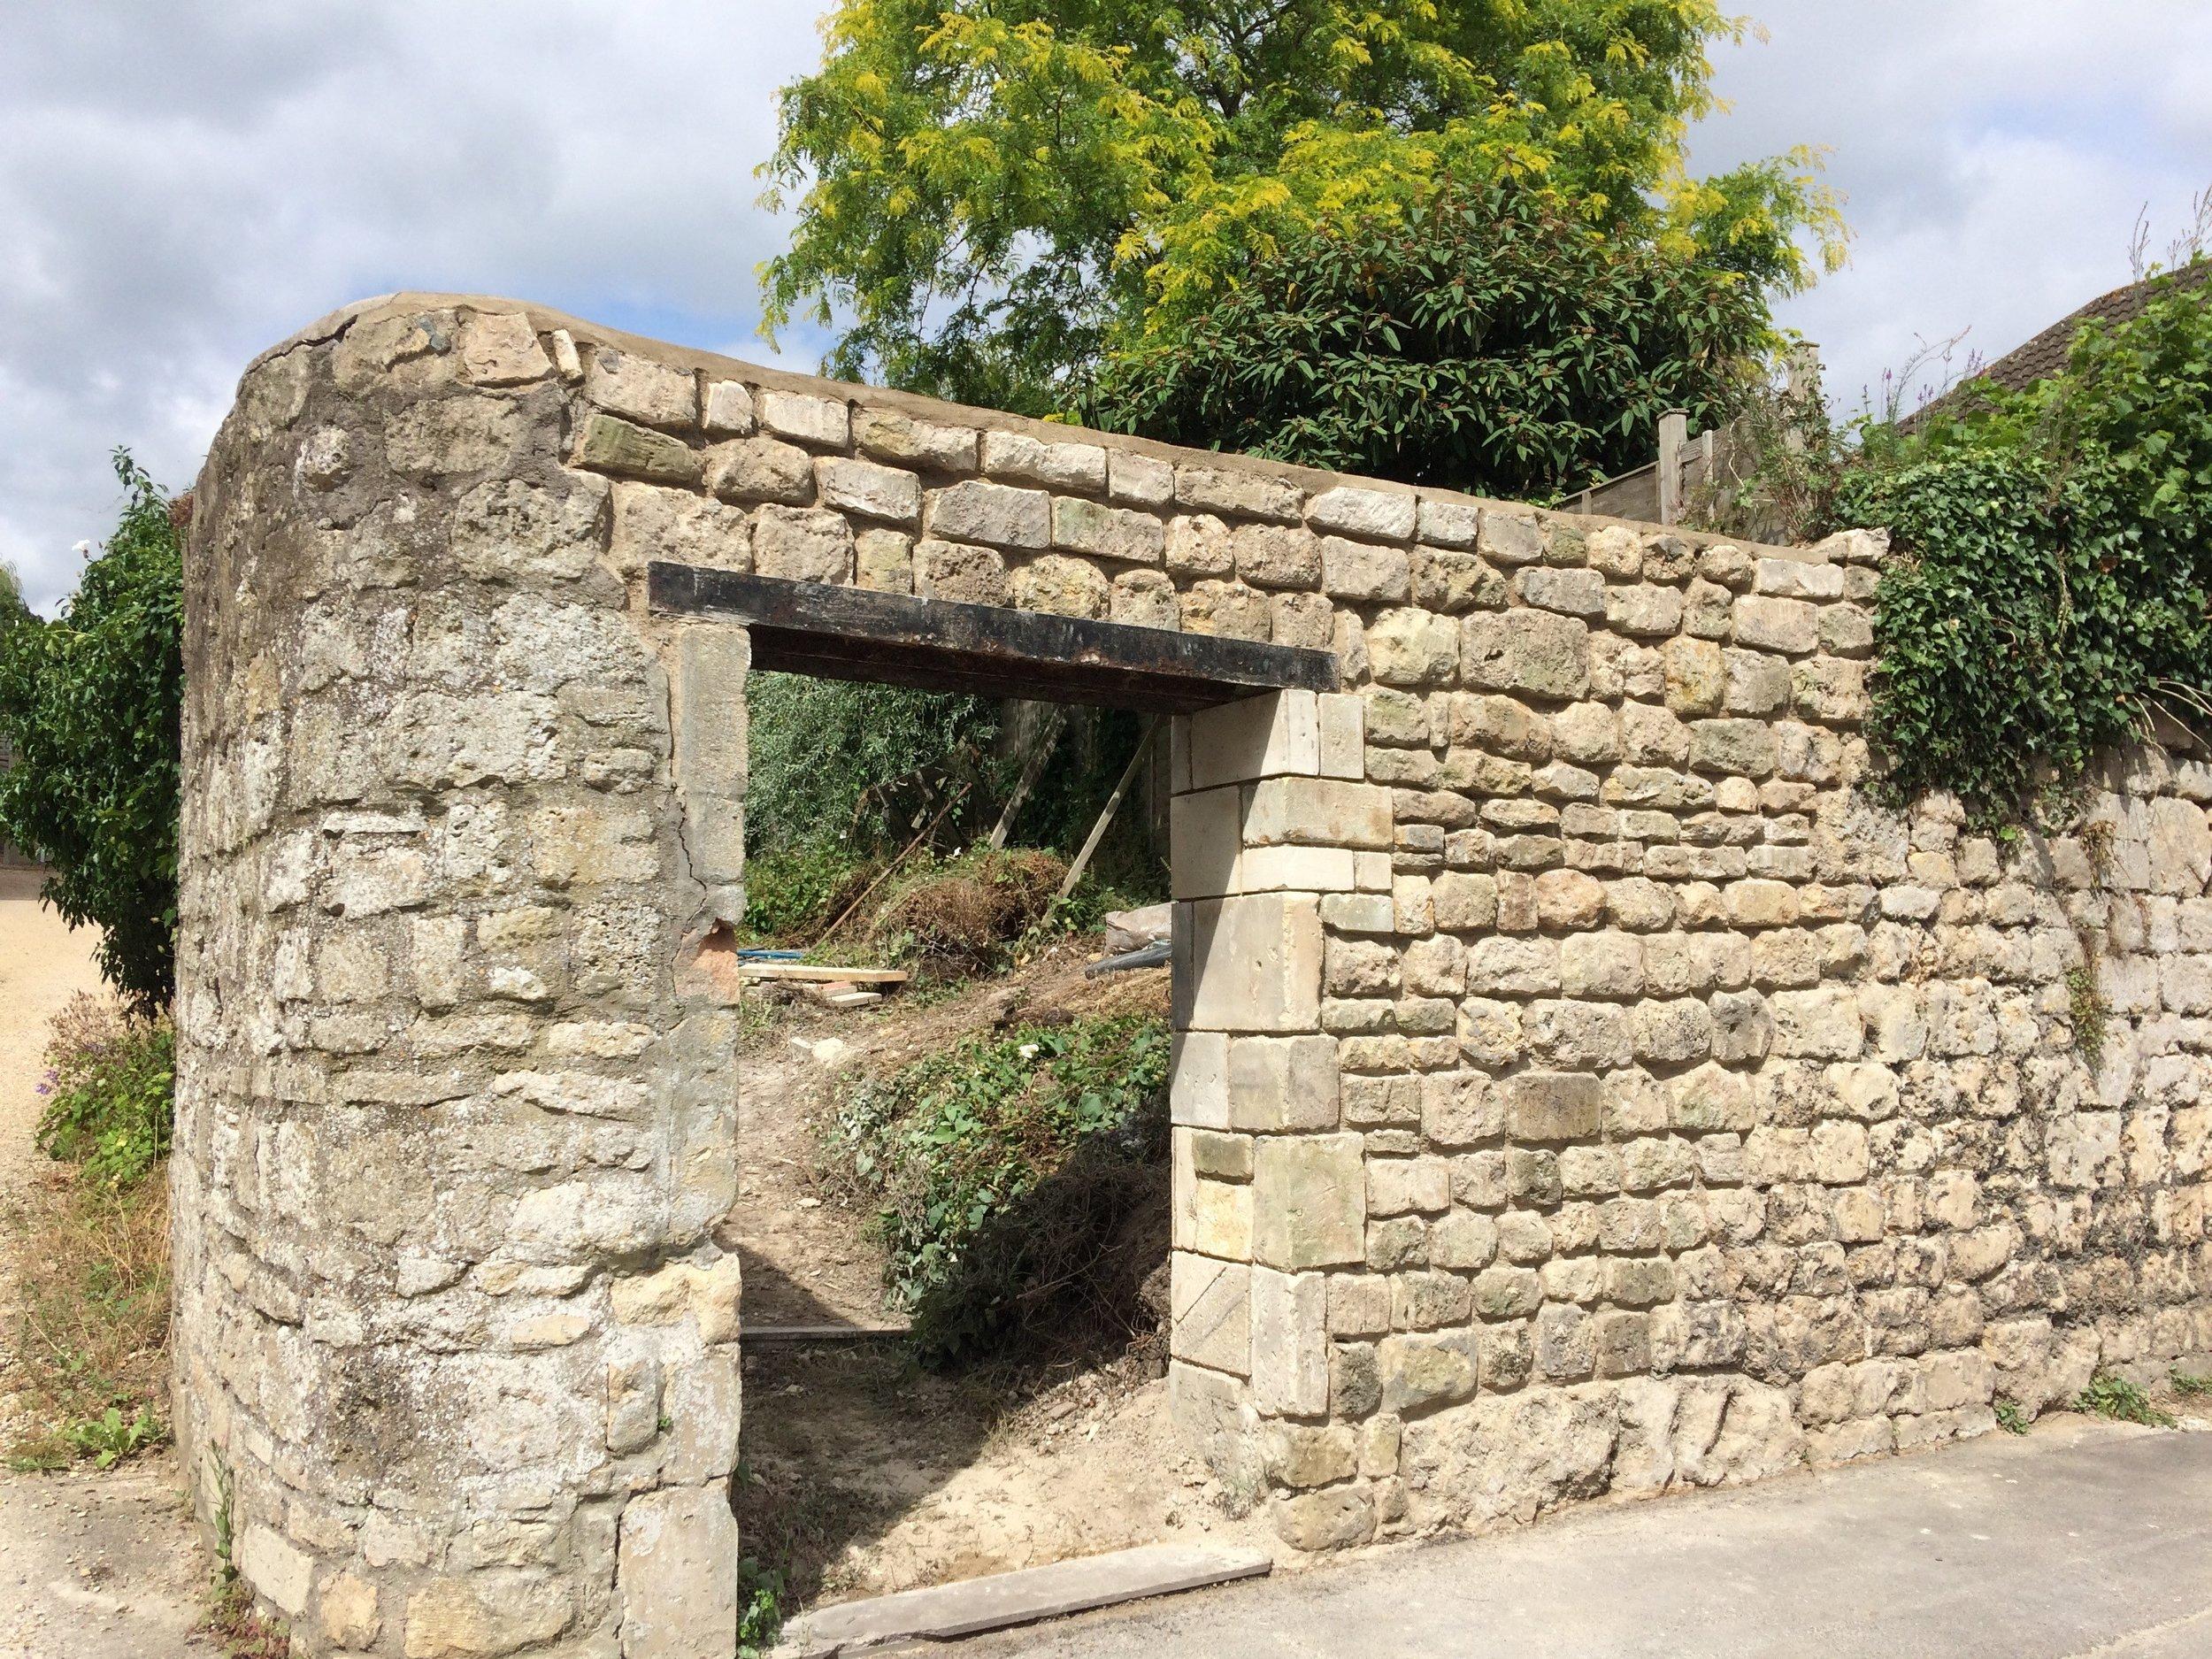 Beckford's wall, awaiting mortar, 14.7.17